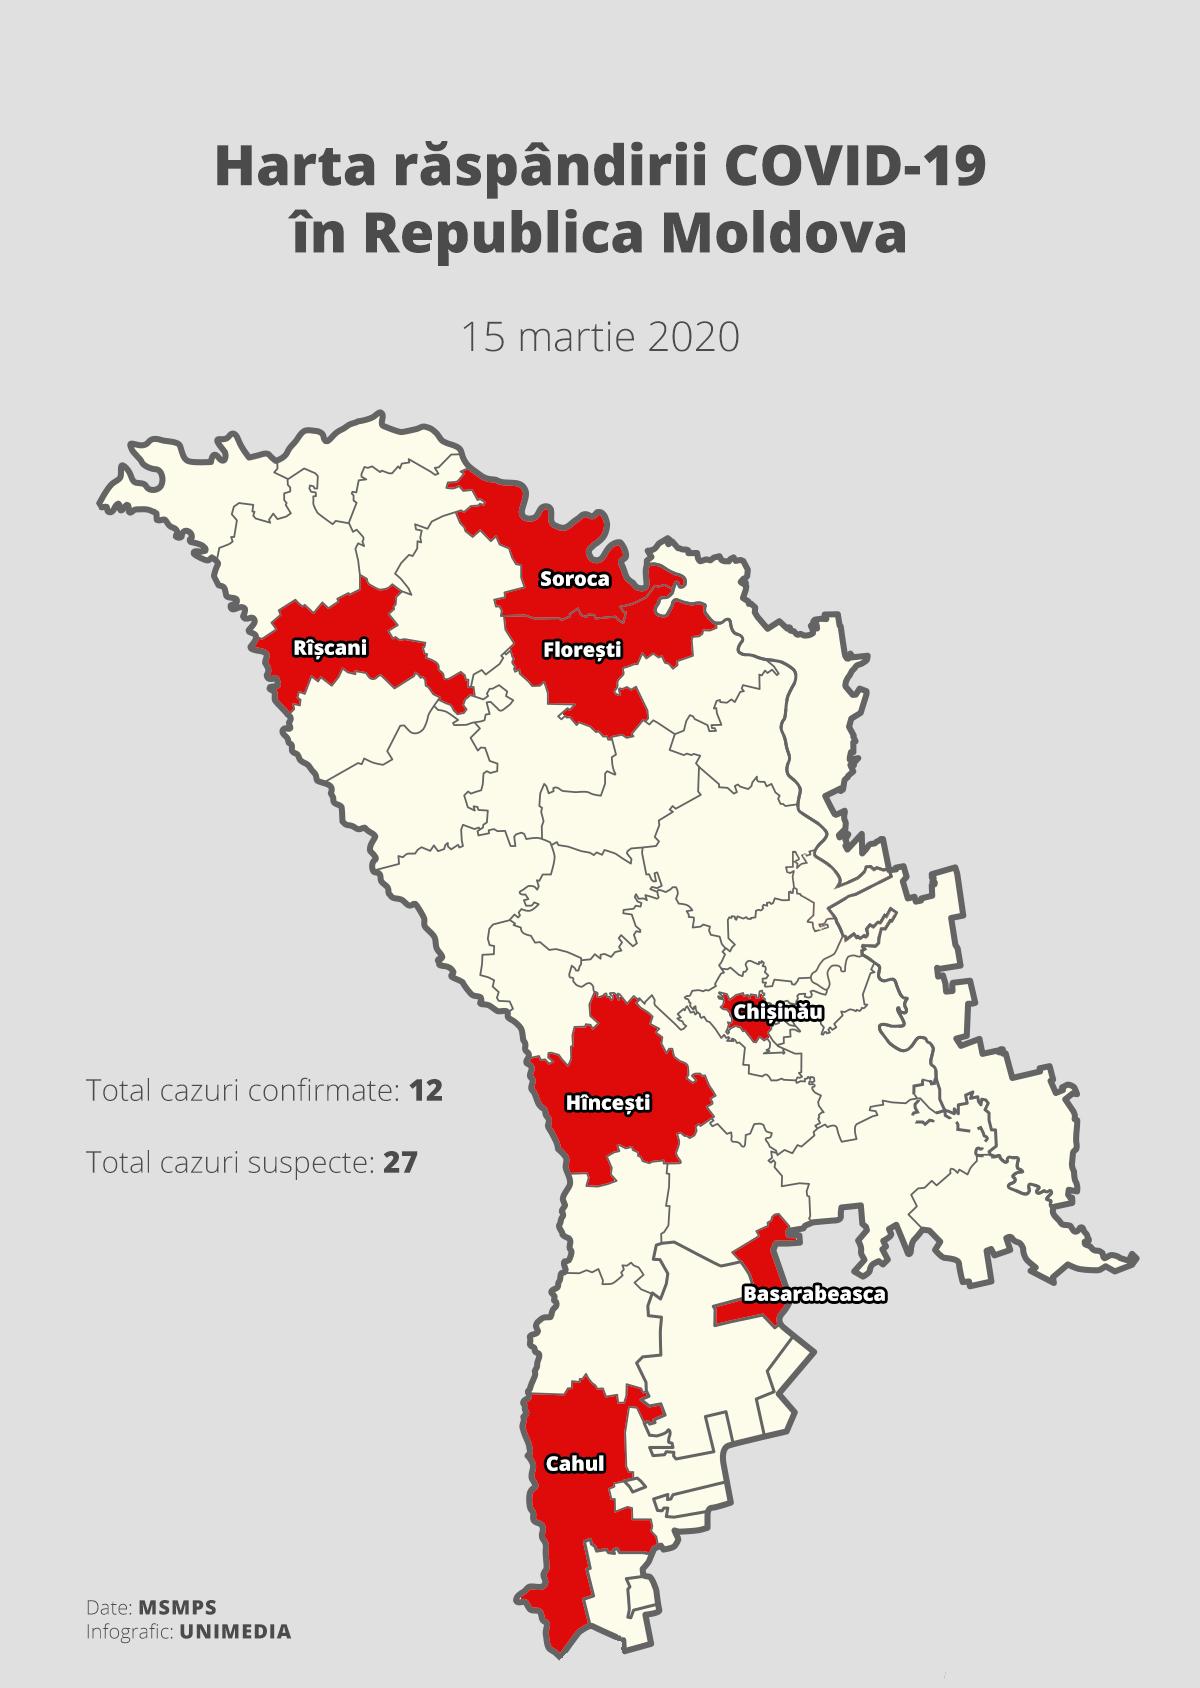 Harta Republicii Moldova